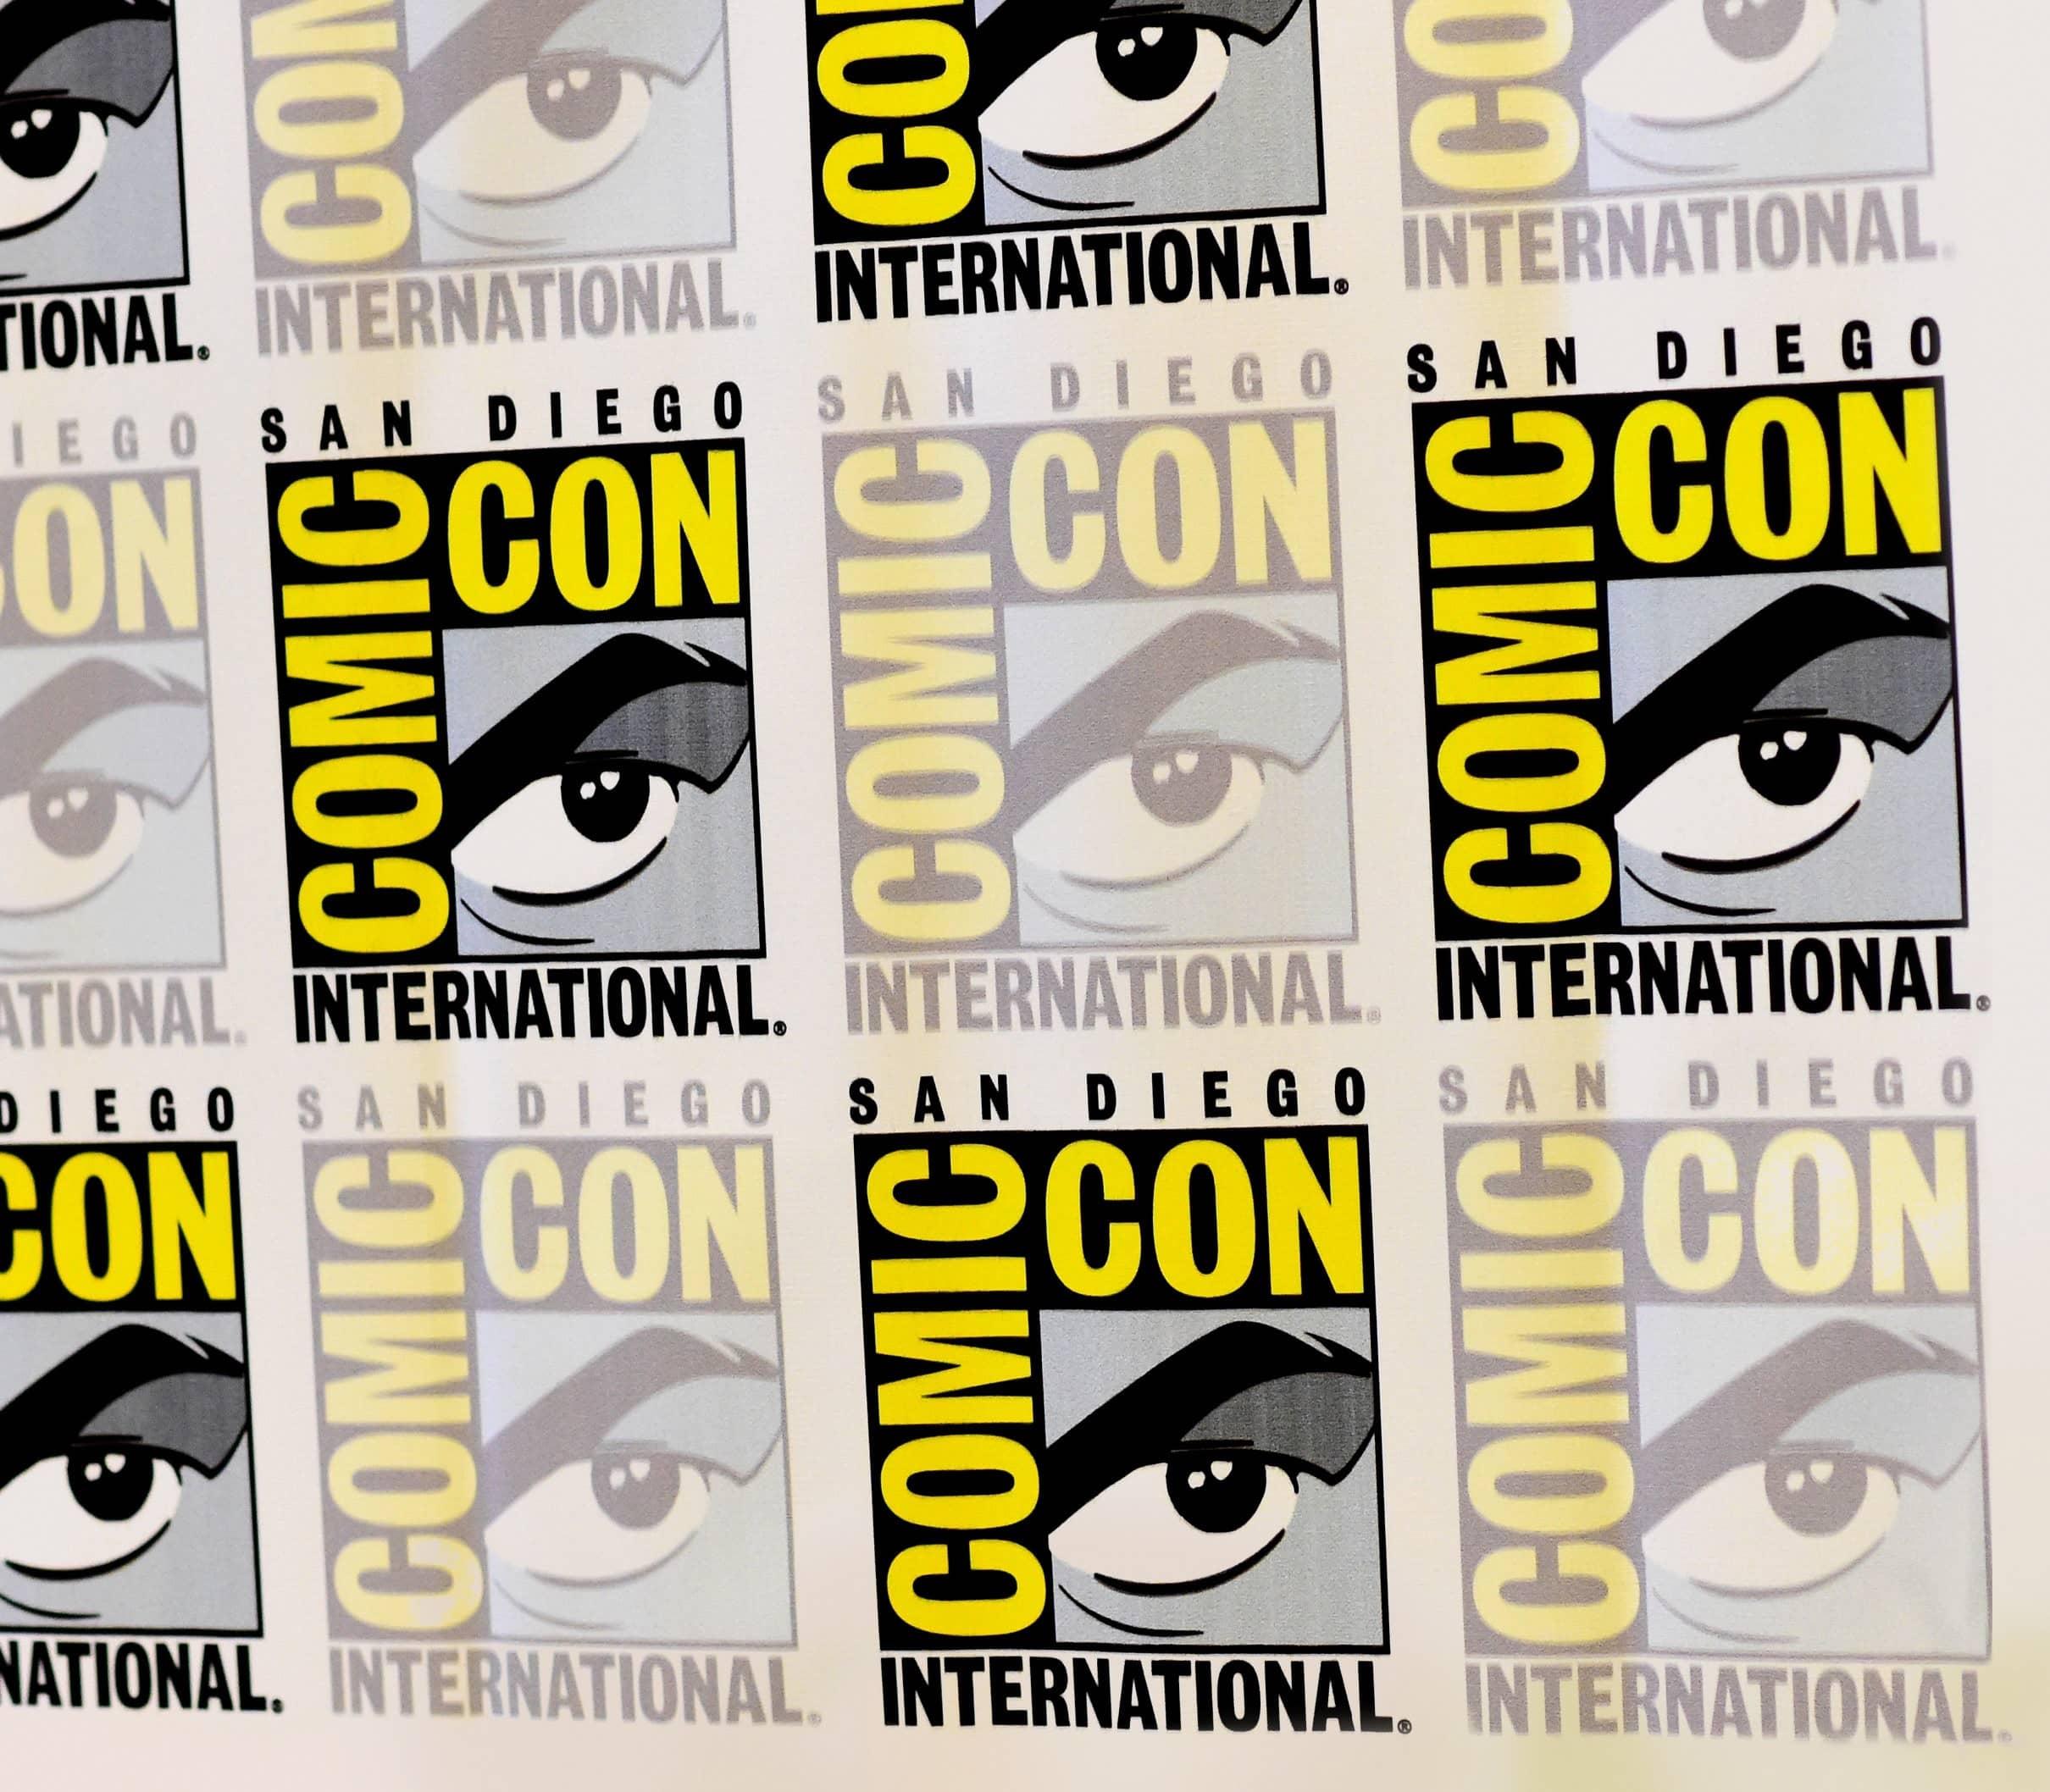 Comic-Con Canceled Over Coronavirus, Plans 2021 Return